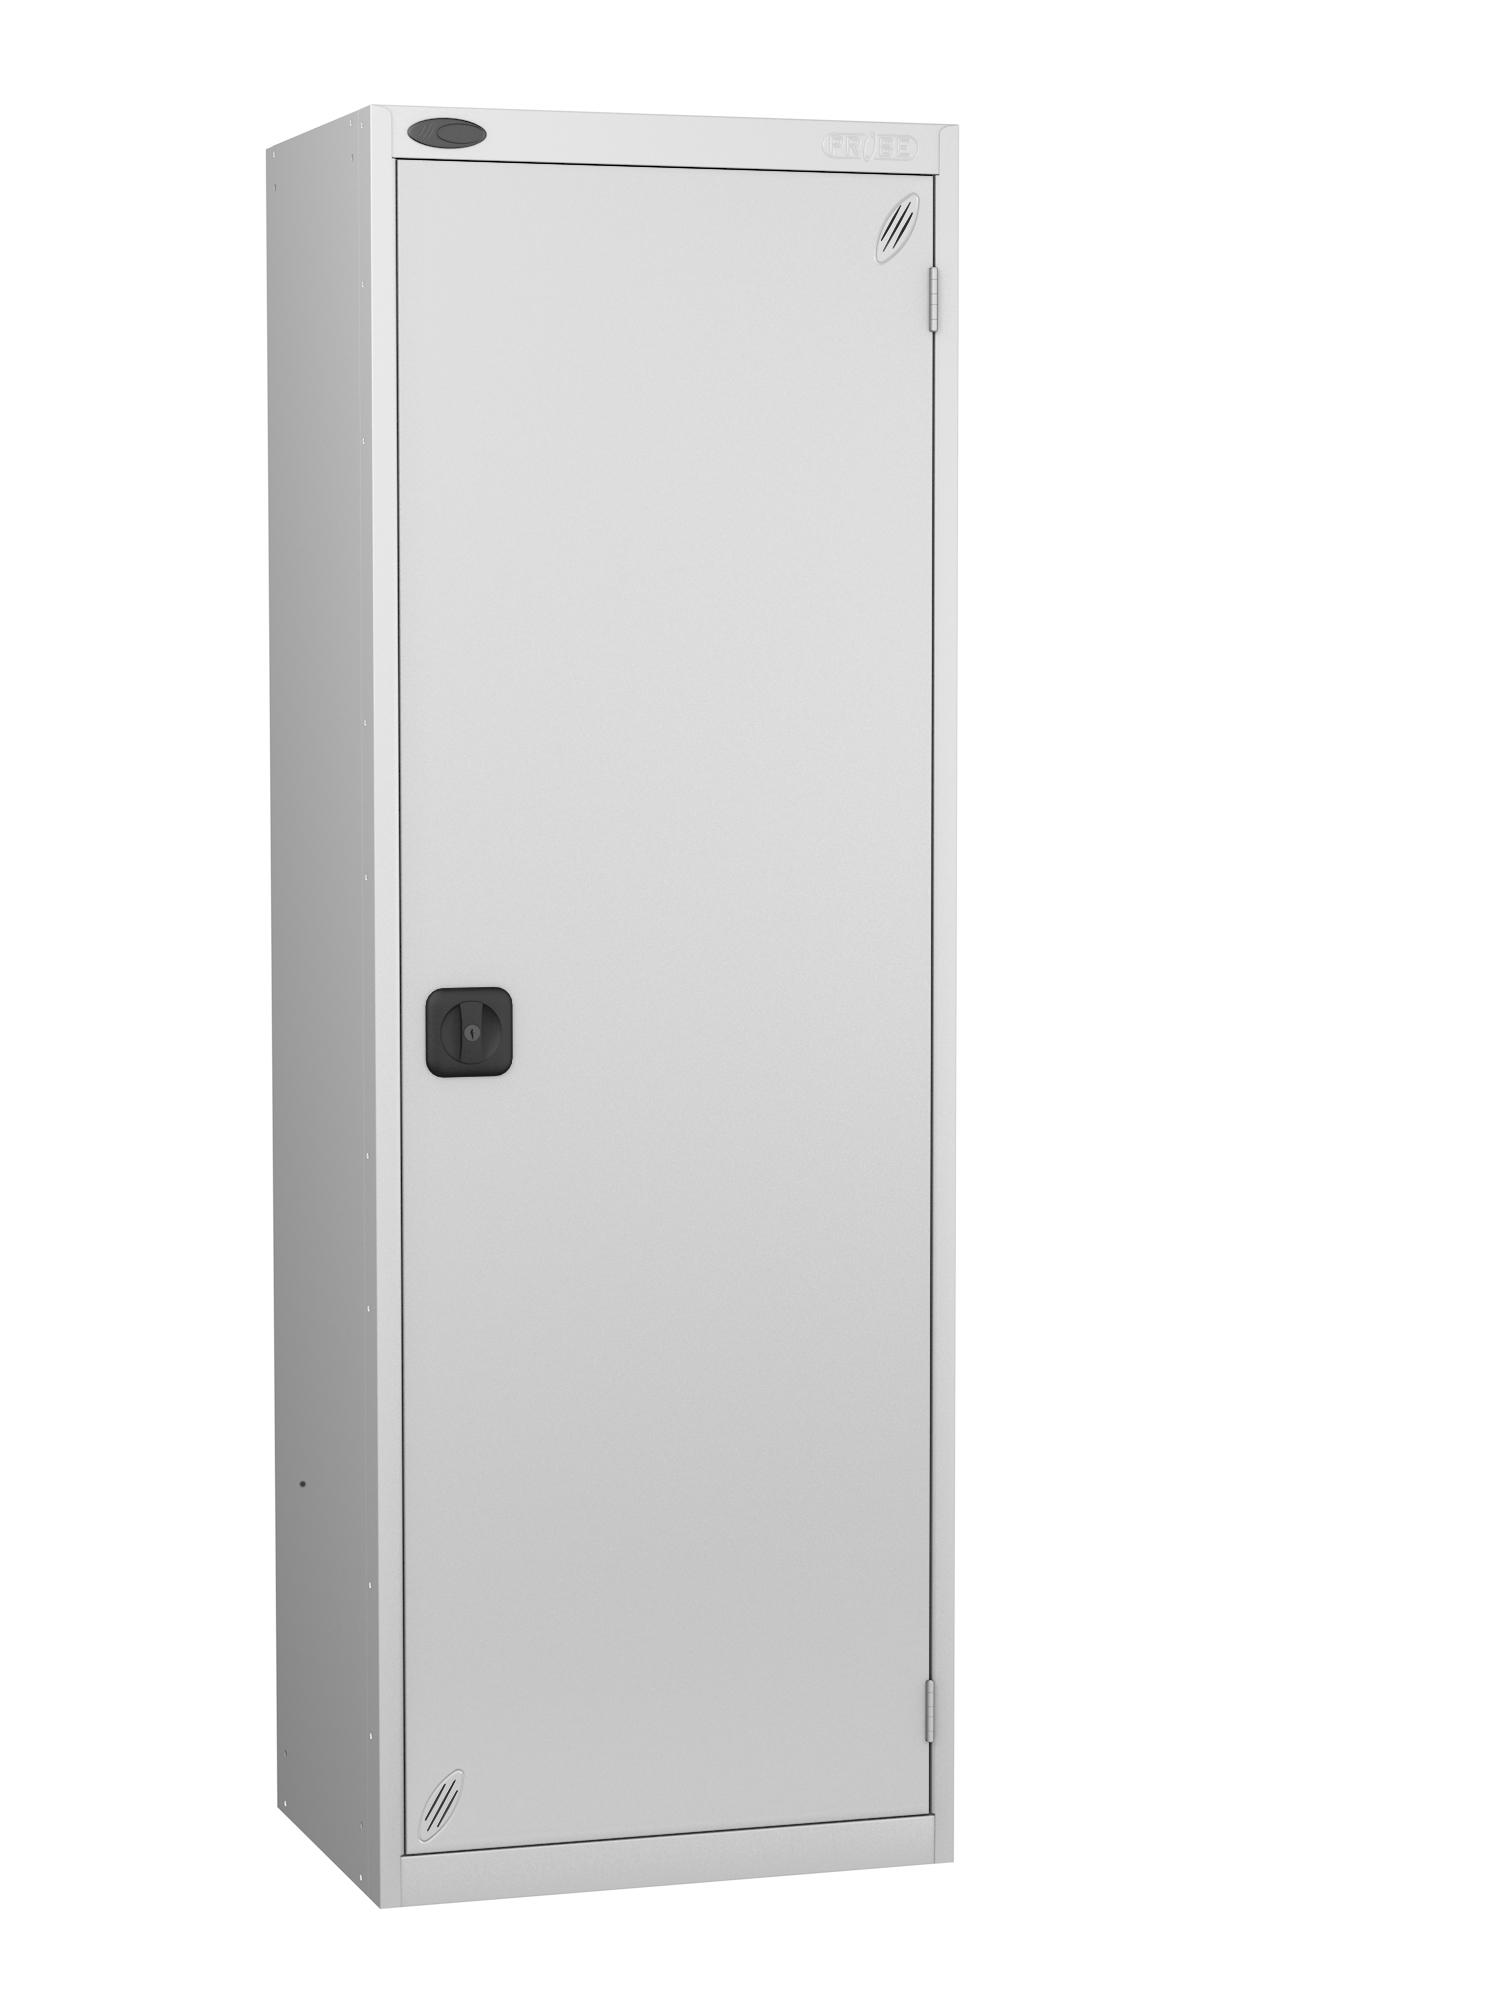 Probe high capacity specialist locker with silver door